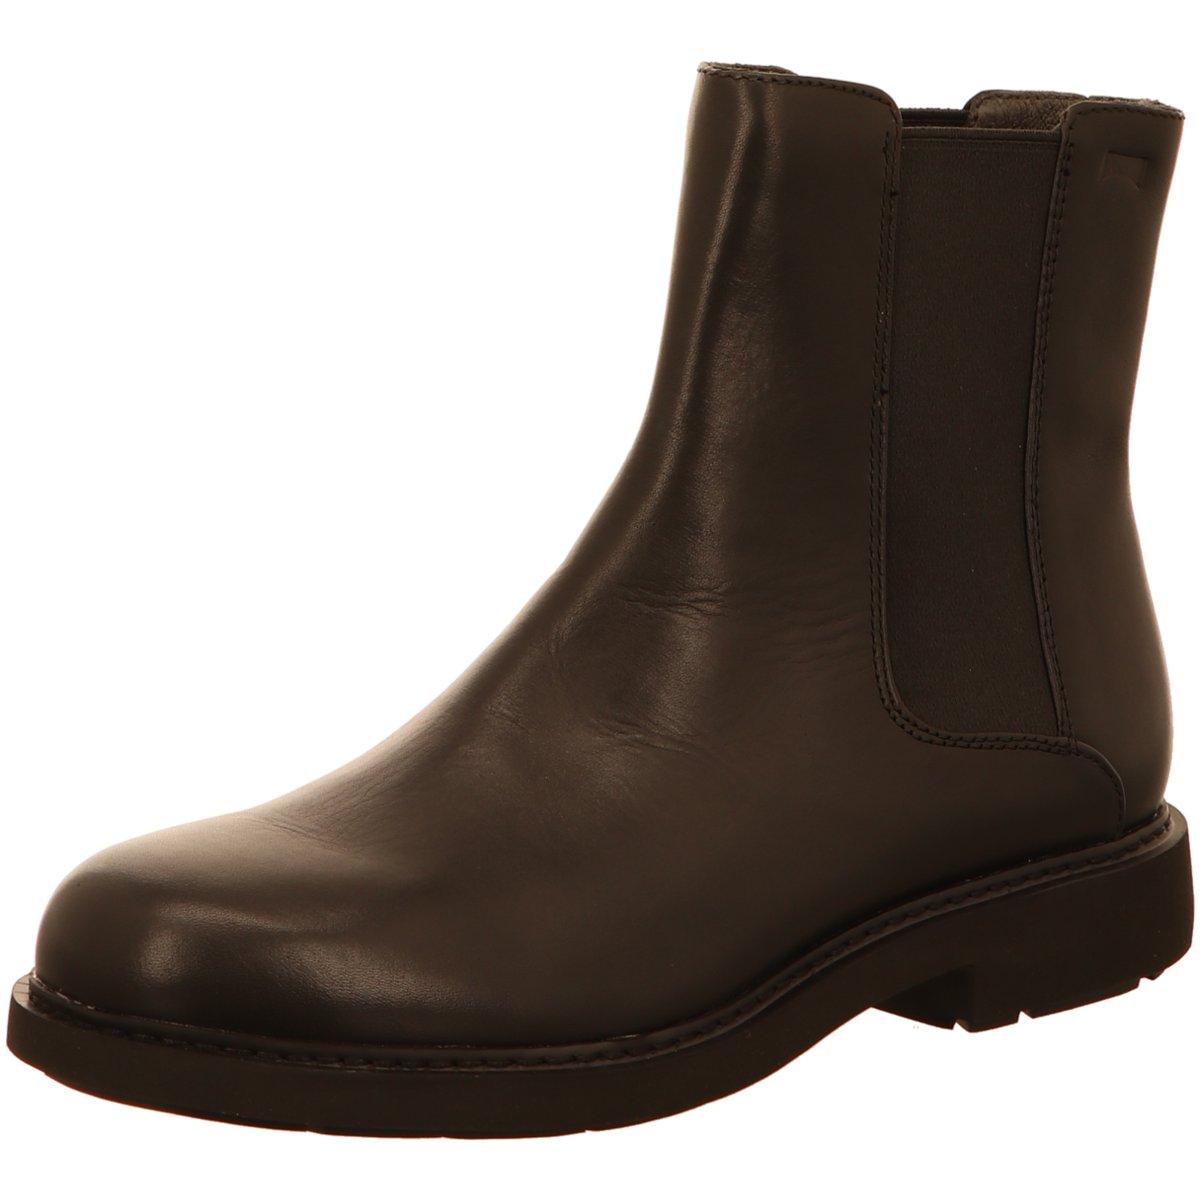 NEU Camper Damen Stiefeletten K400246 001 negro schwarz 342981